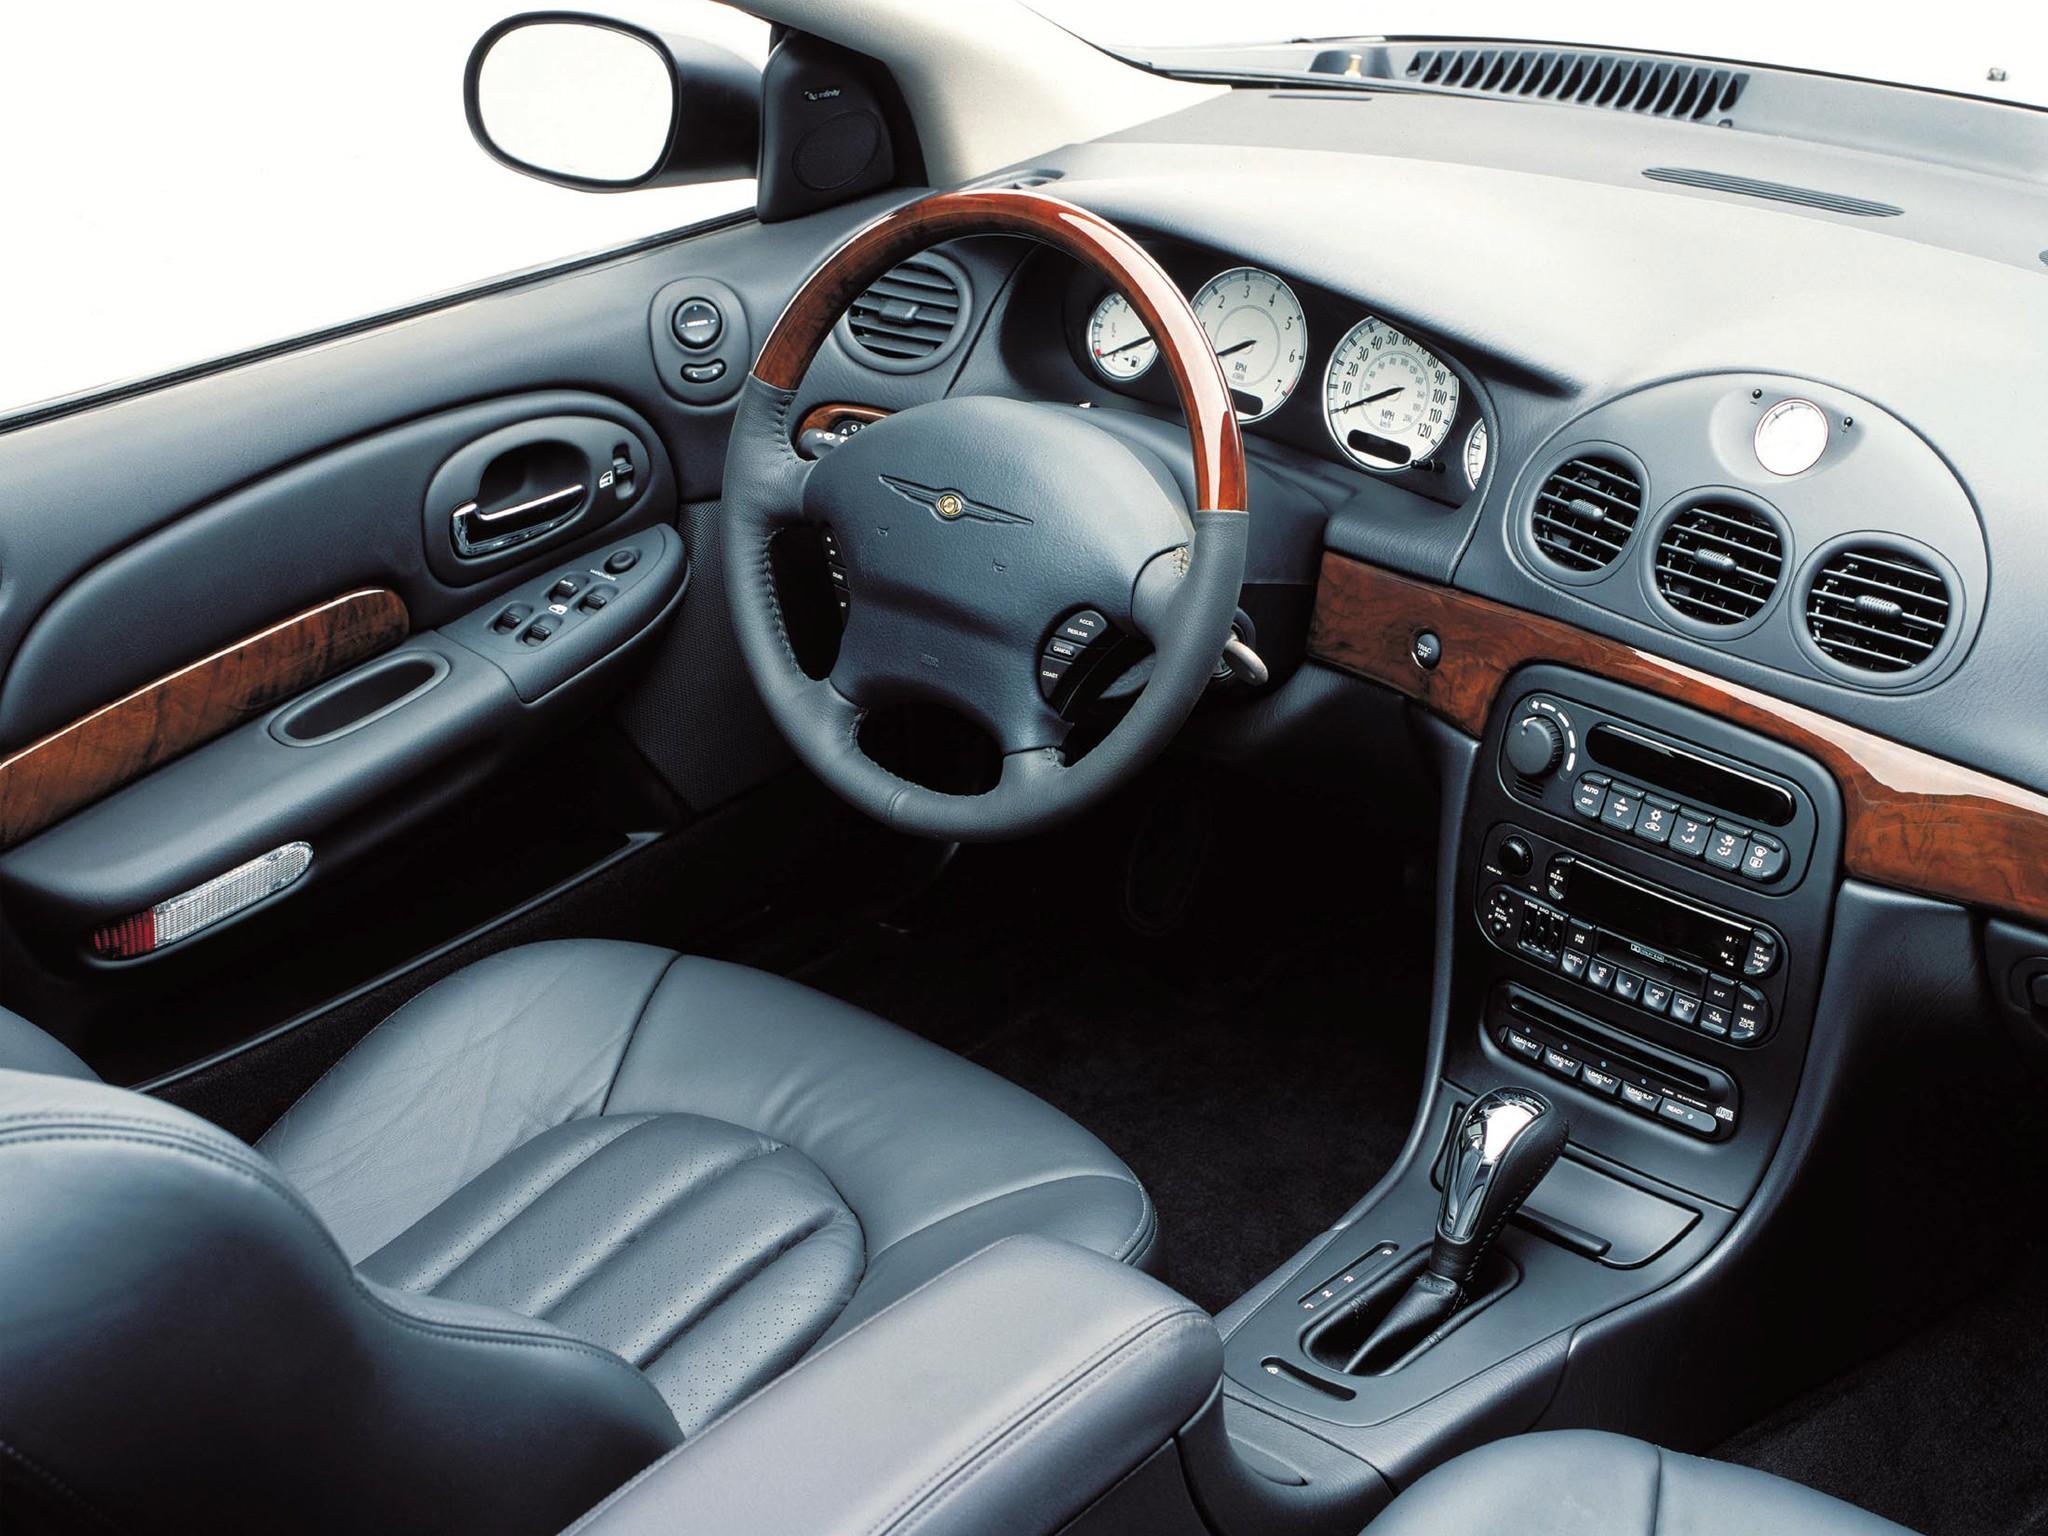 Chrysler 300m specs 1998 1999 2000 2001 2002 2003 2004 autoevolution